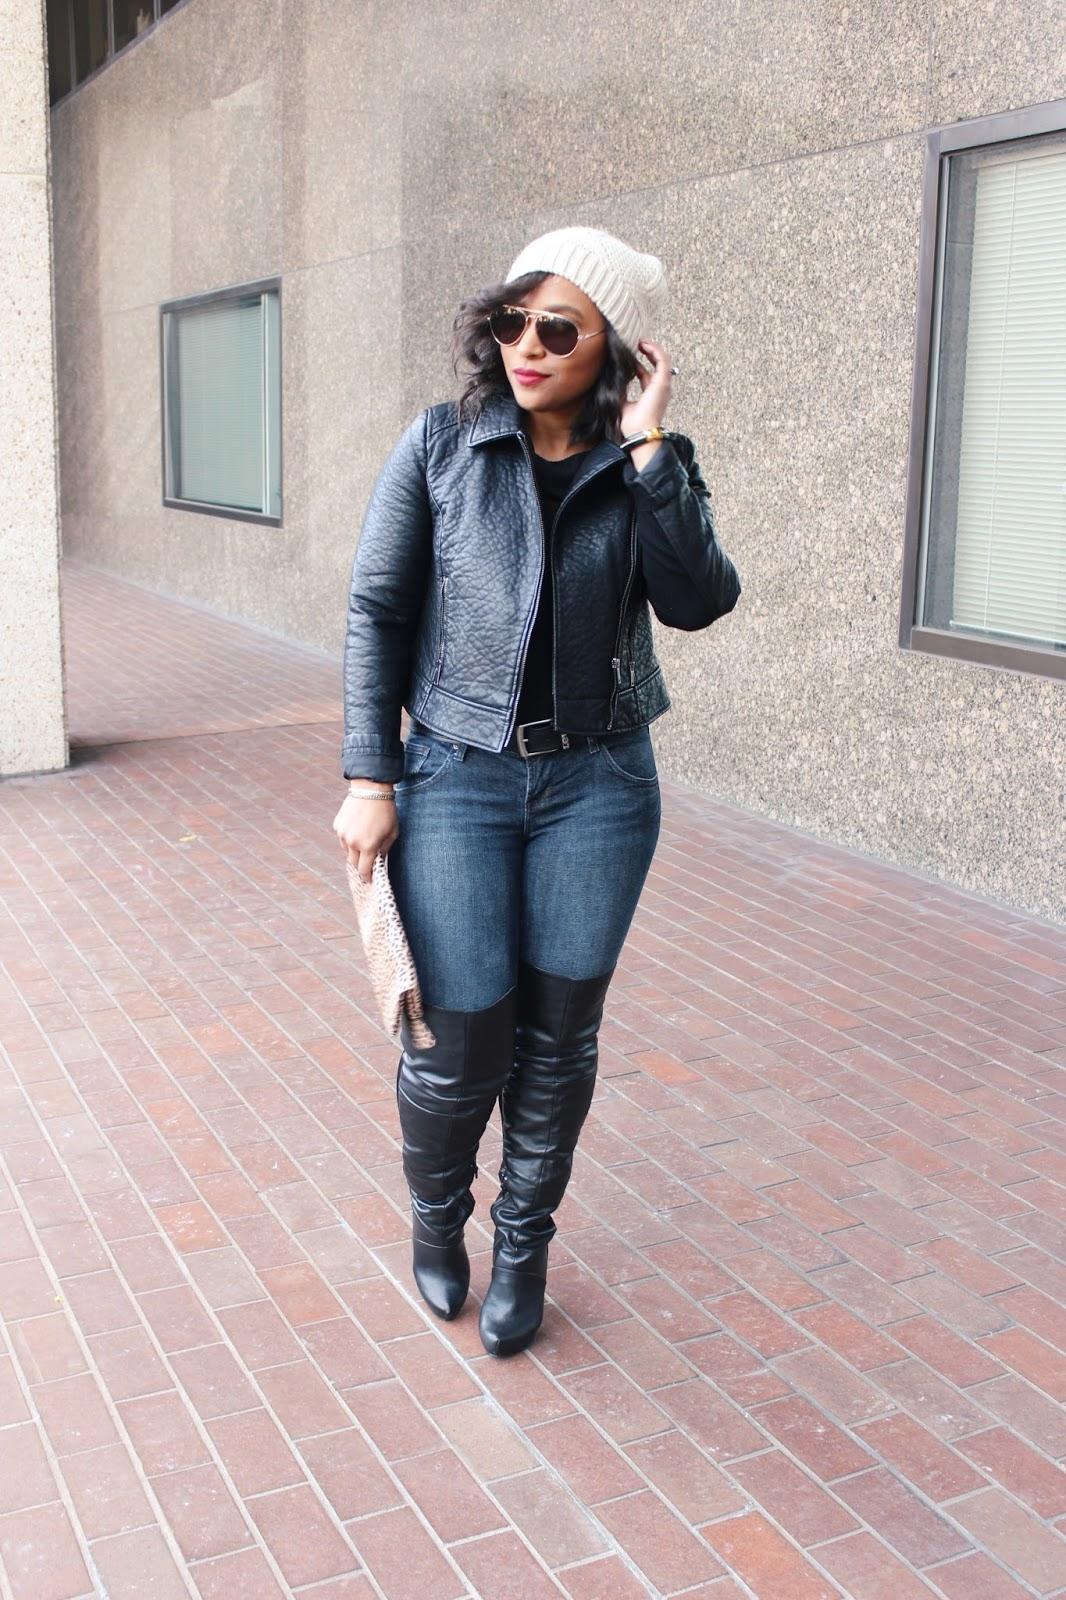 moto jacket, all black look, otk boots, black boots, edgy look, black jacket, faux leather